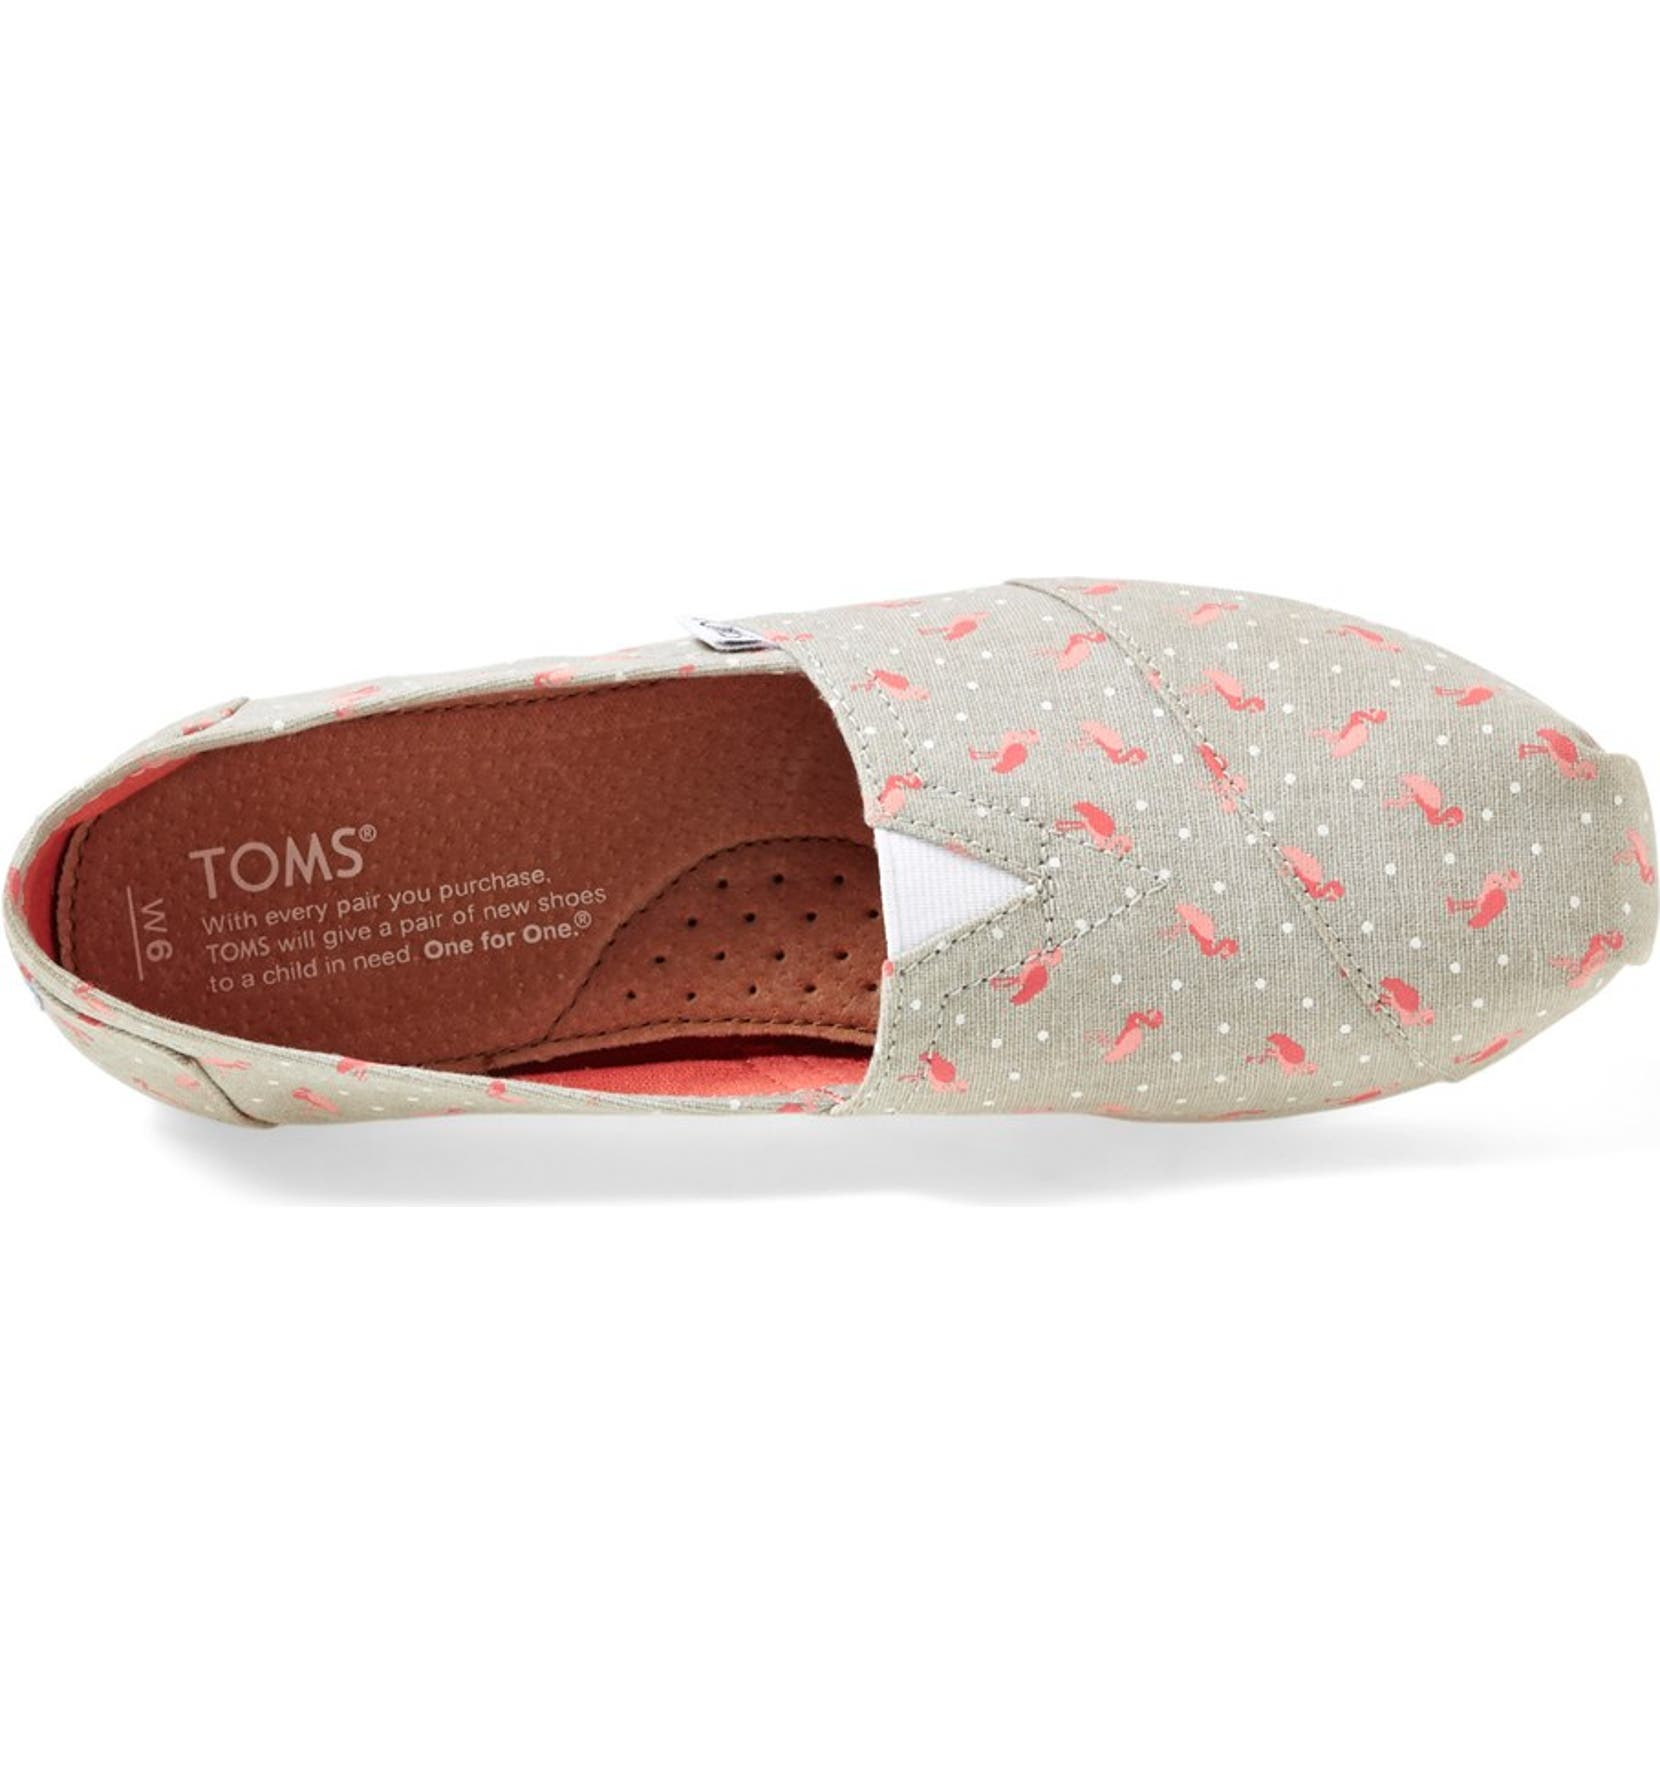 294478a8803 TOMS  Classic - Flamingo  Alpargata Slip-On (Women)